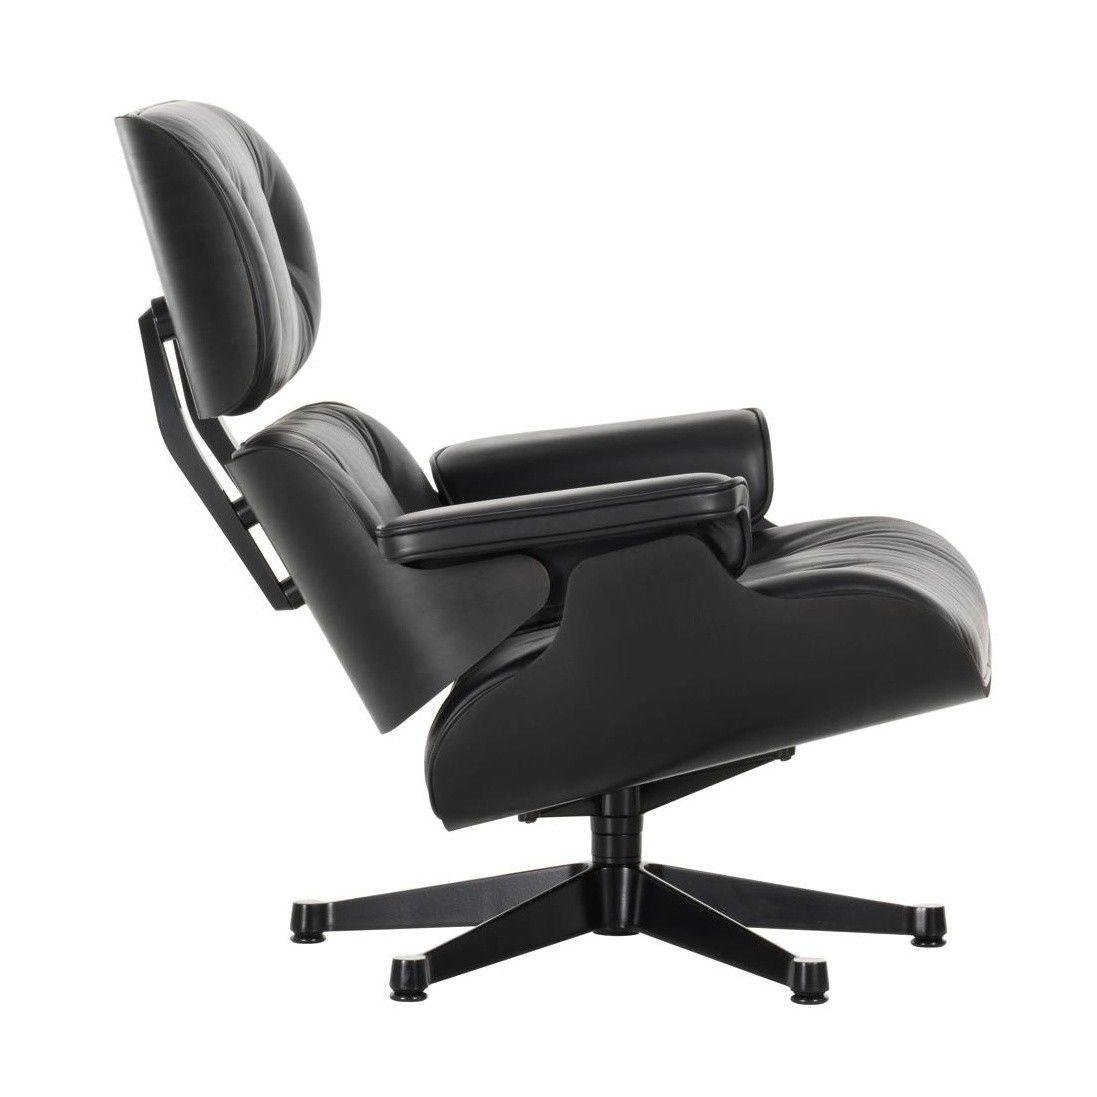 eames lounge chair drehsessel - Eames Lounge Stuhl Abmessungen